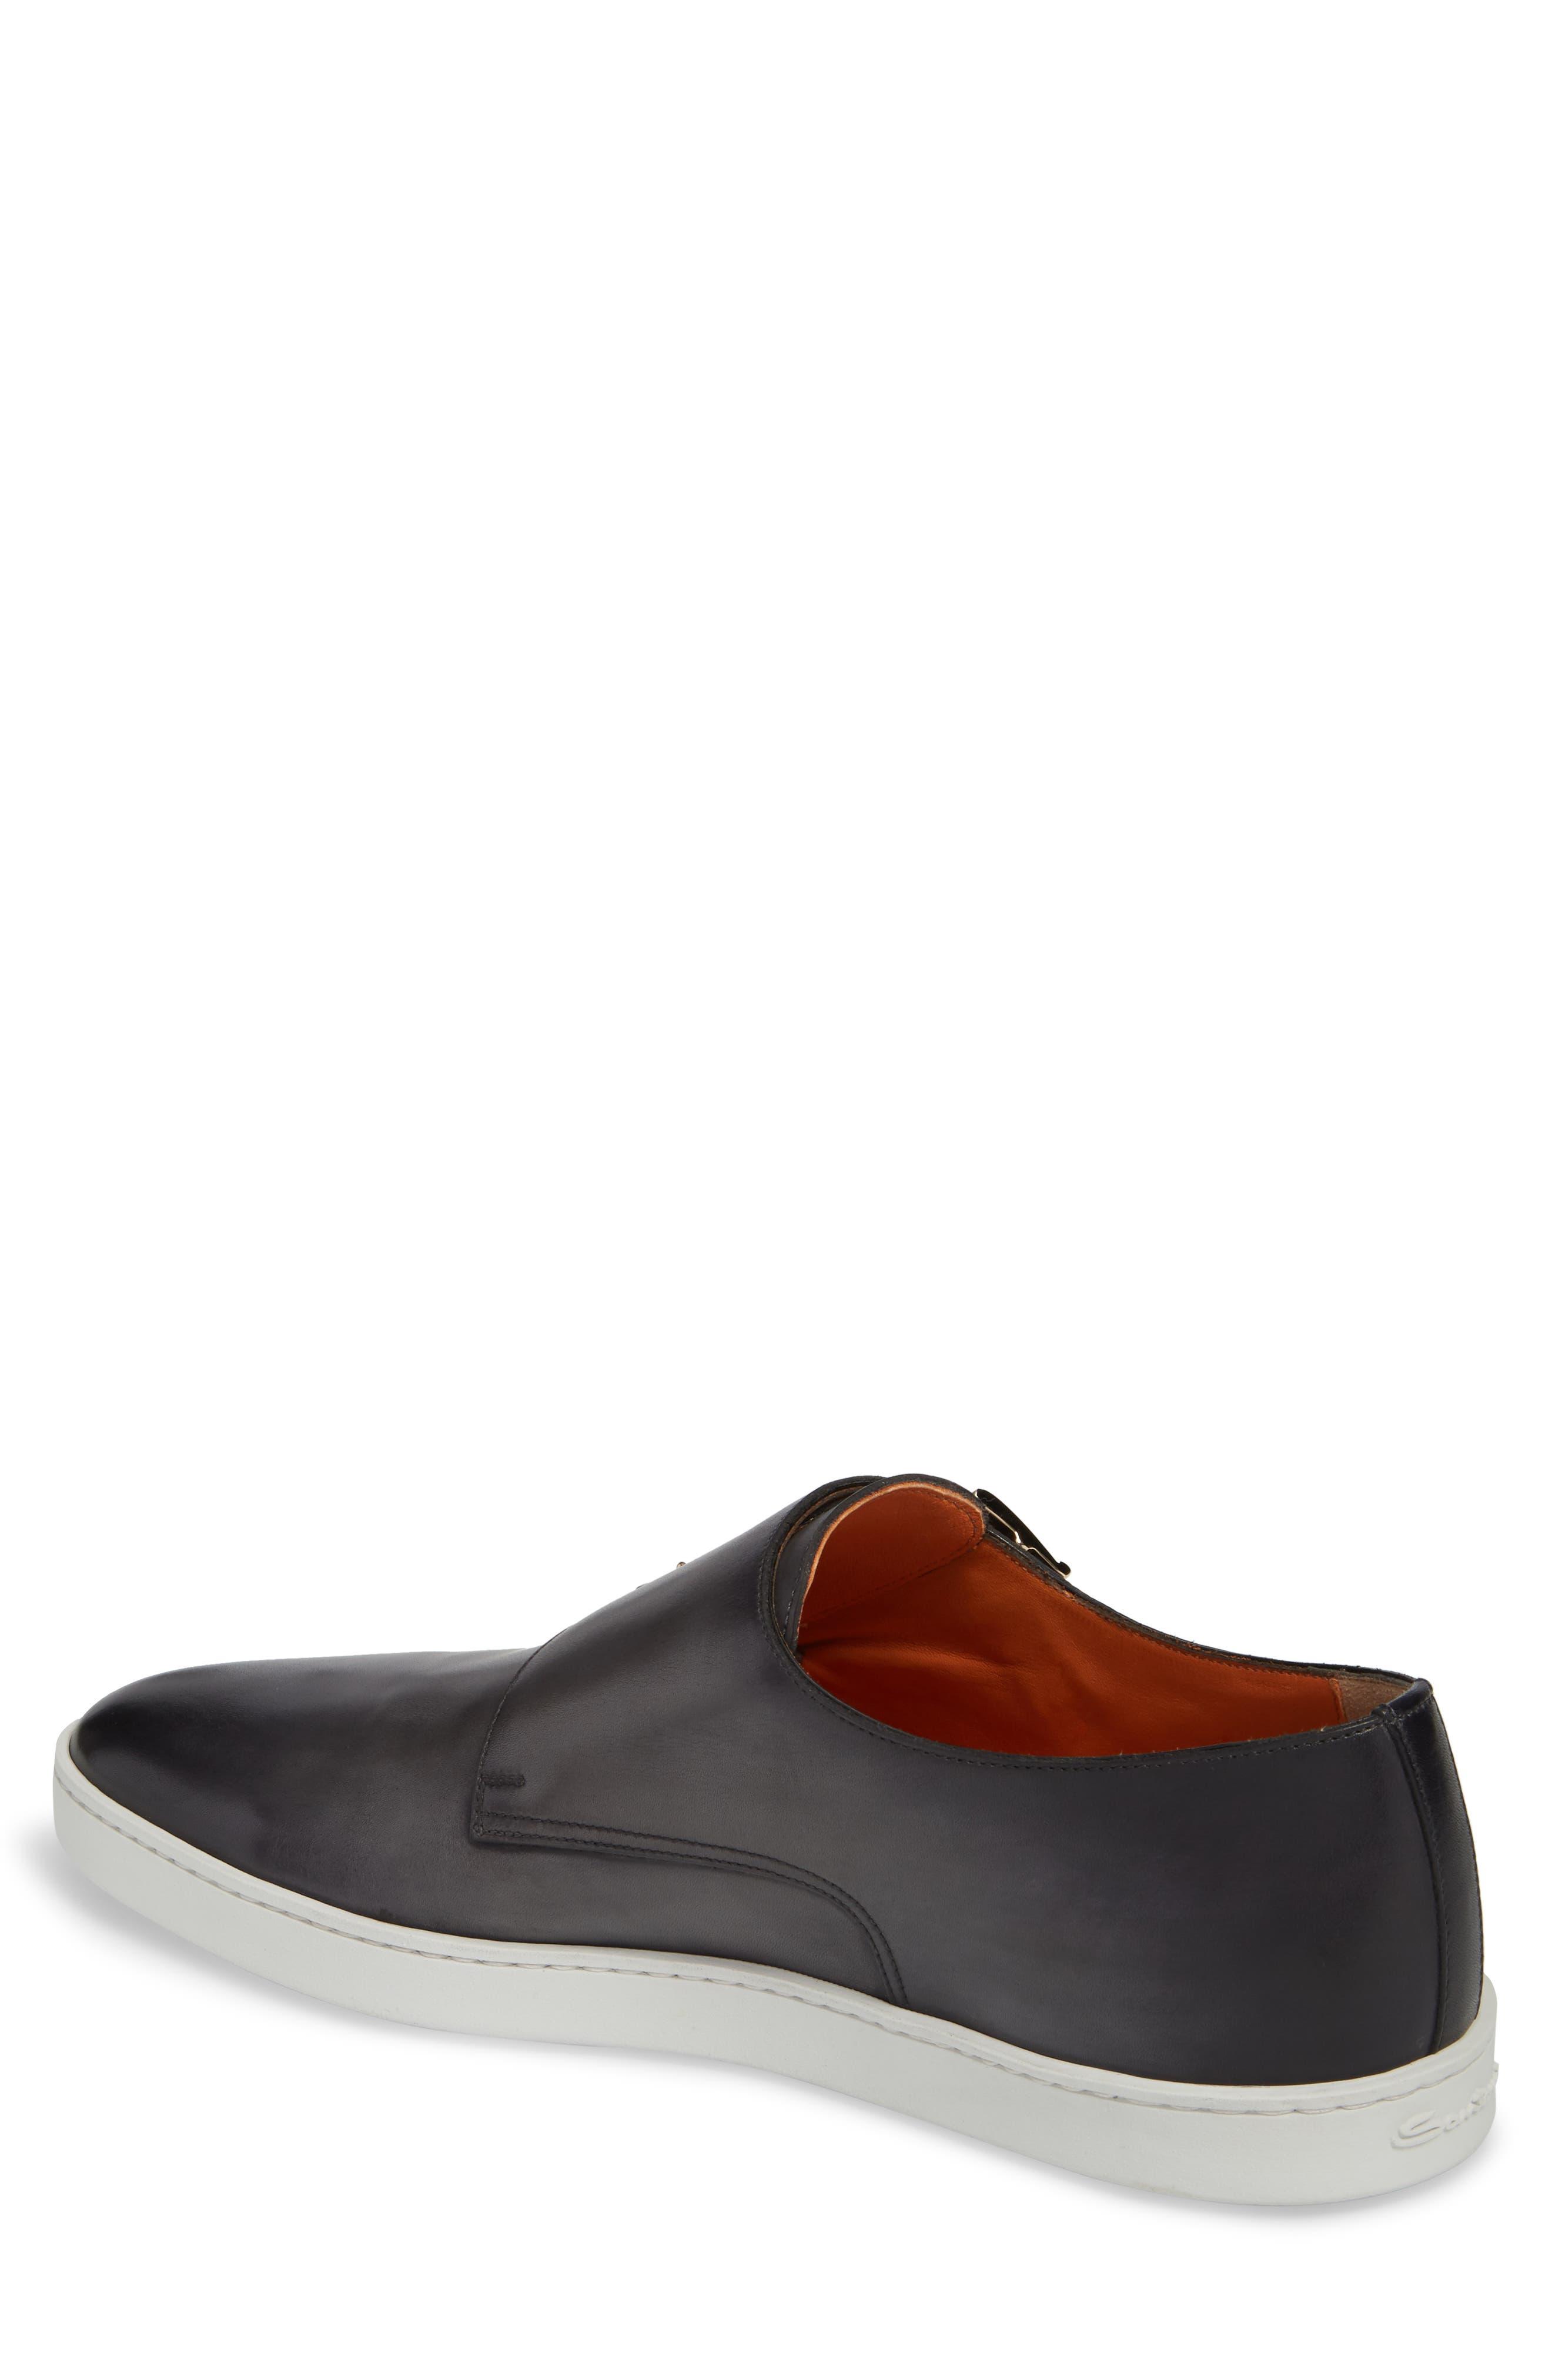 Freemont Double Monk Strap Shoe,                             Alternate thumbnail 2, color,                             GREY